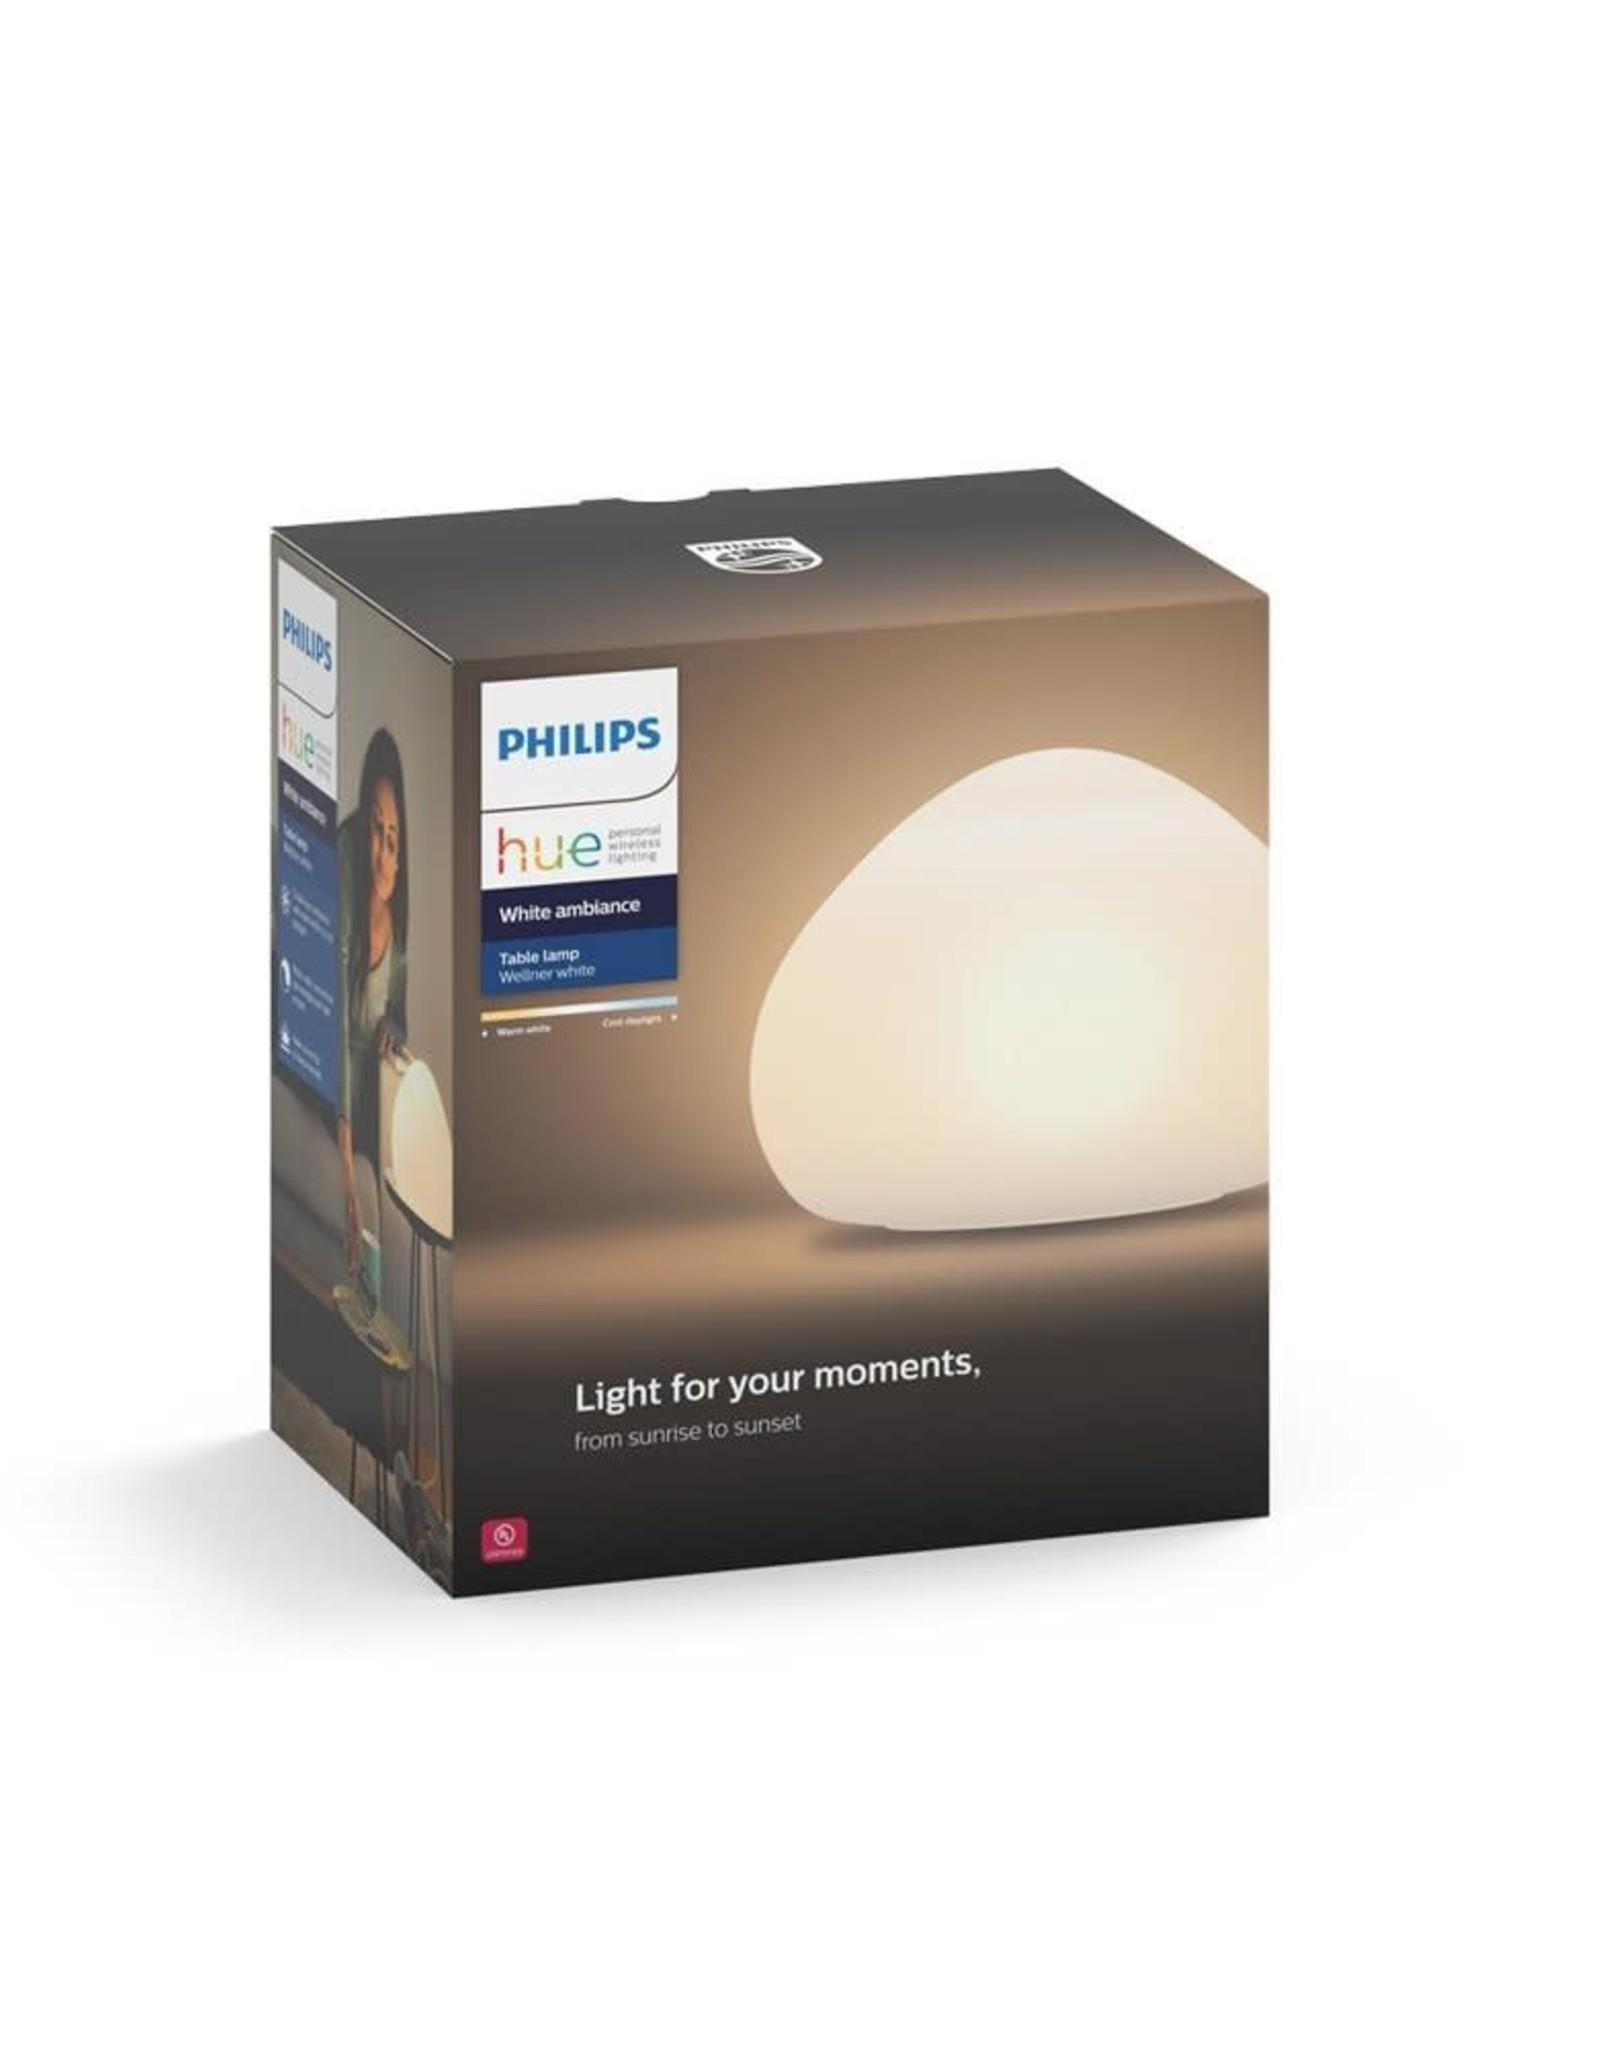 Philips Hue Philips Hue   Huewellner Table Lamp -White-   4100531u7